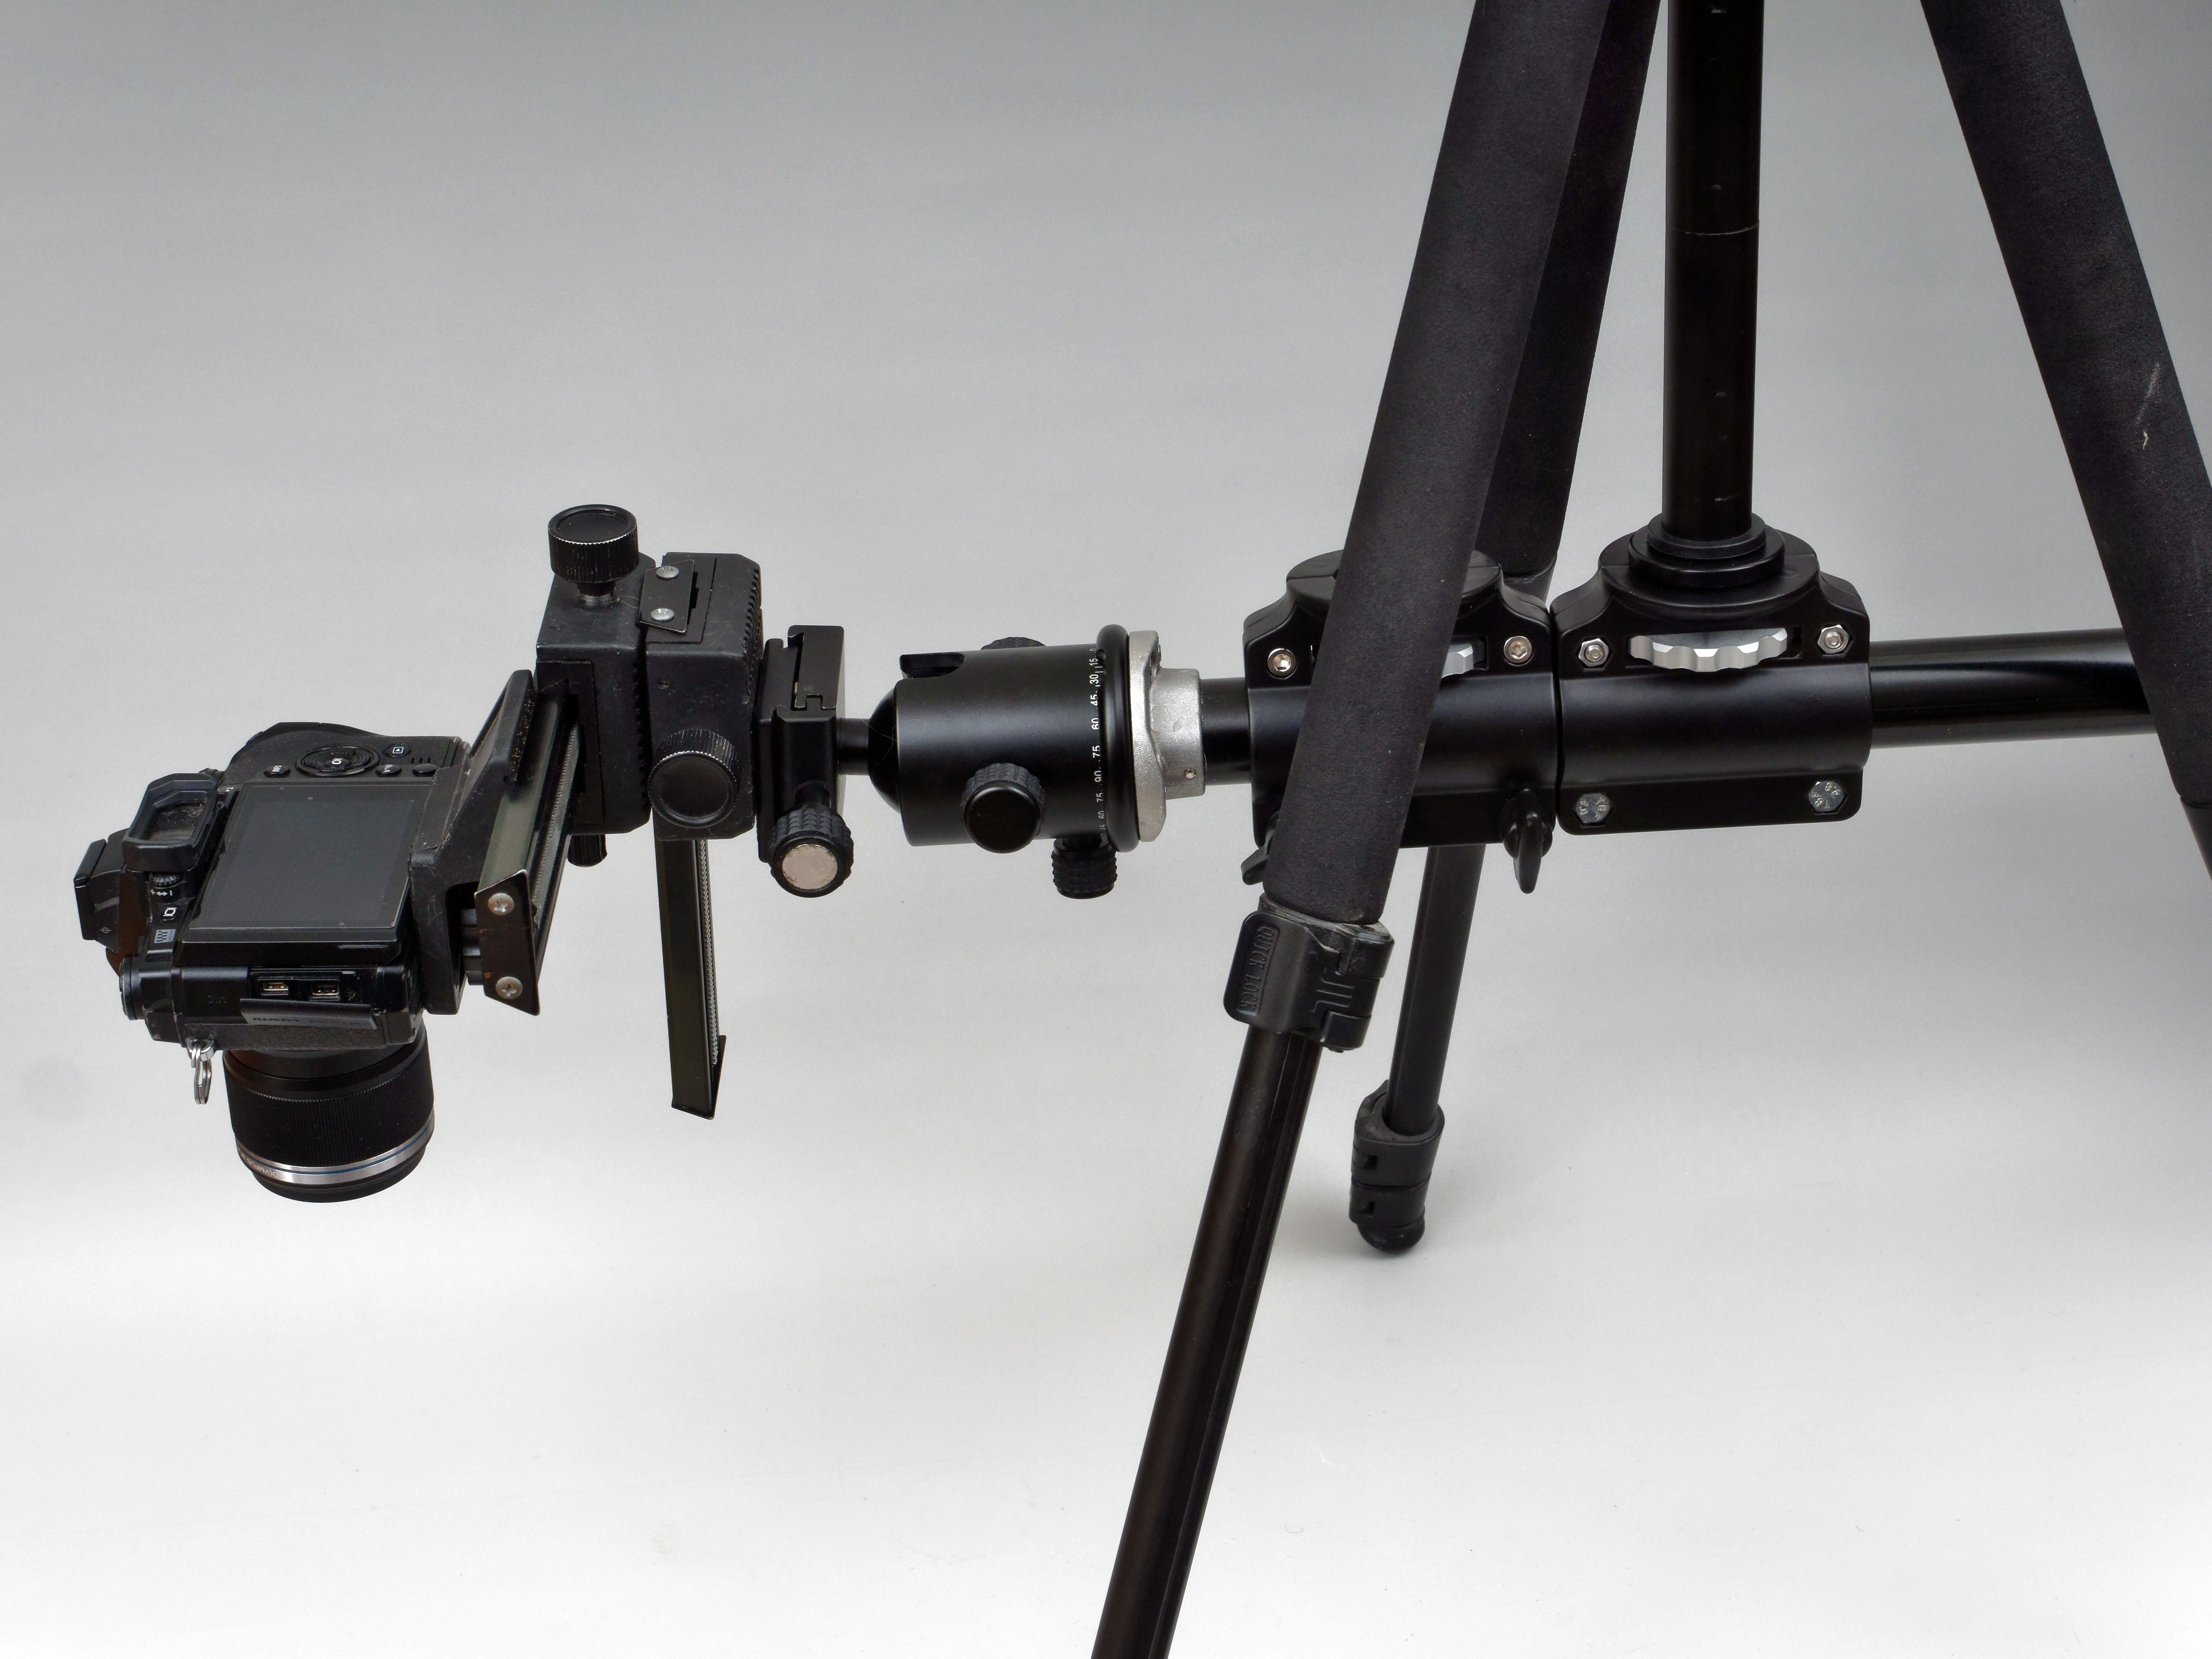 Tripod-arm-6.jpeg